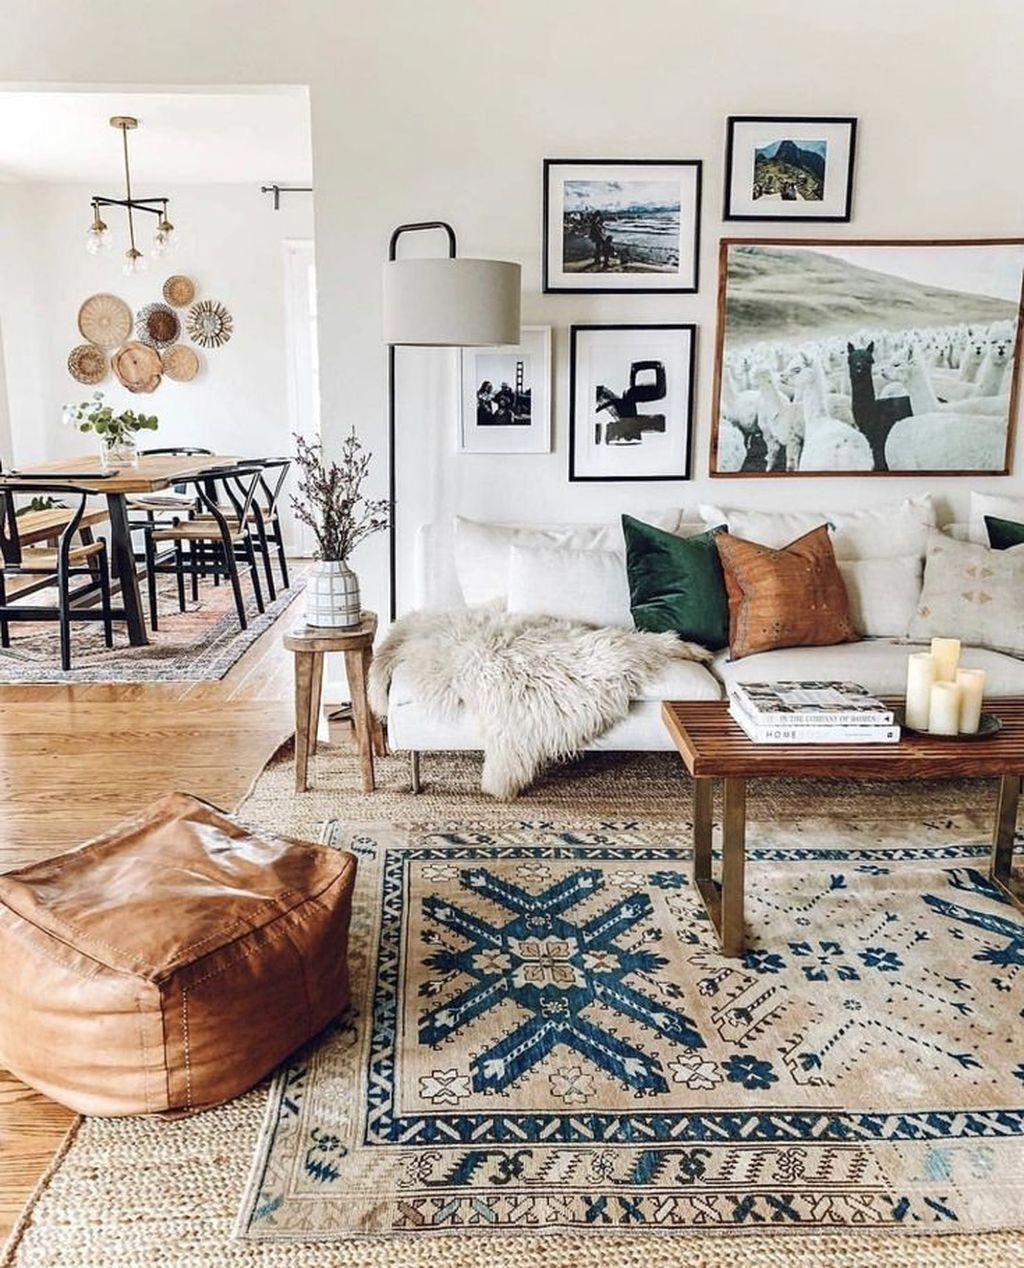 Love the white sofa + accents